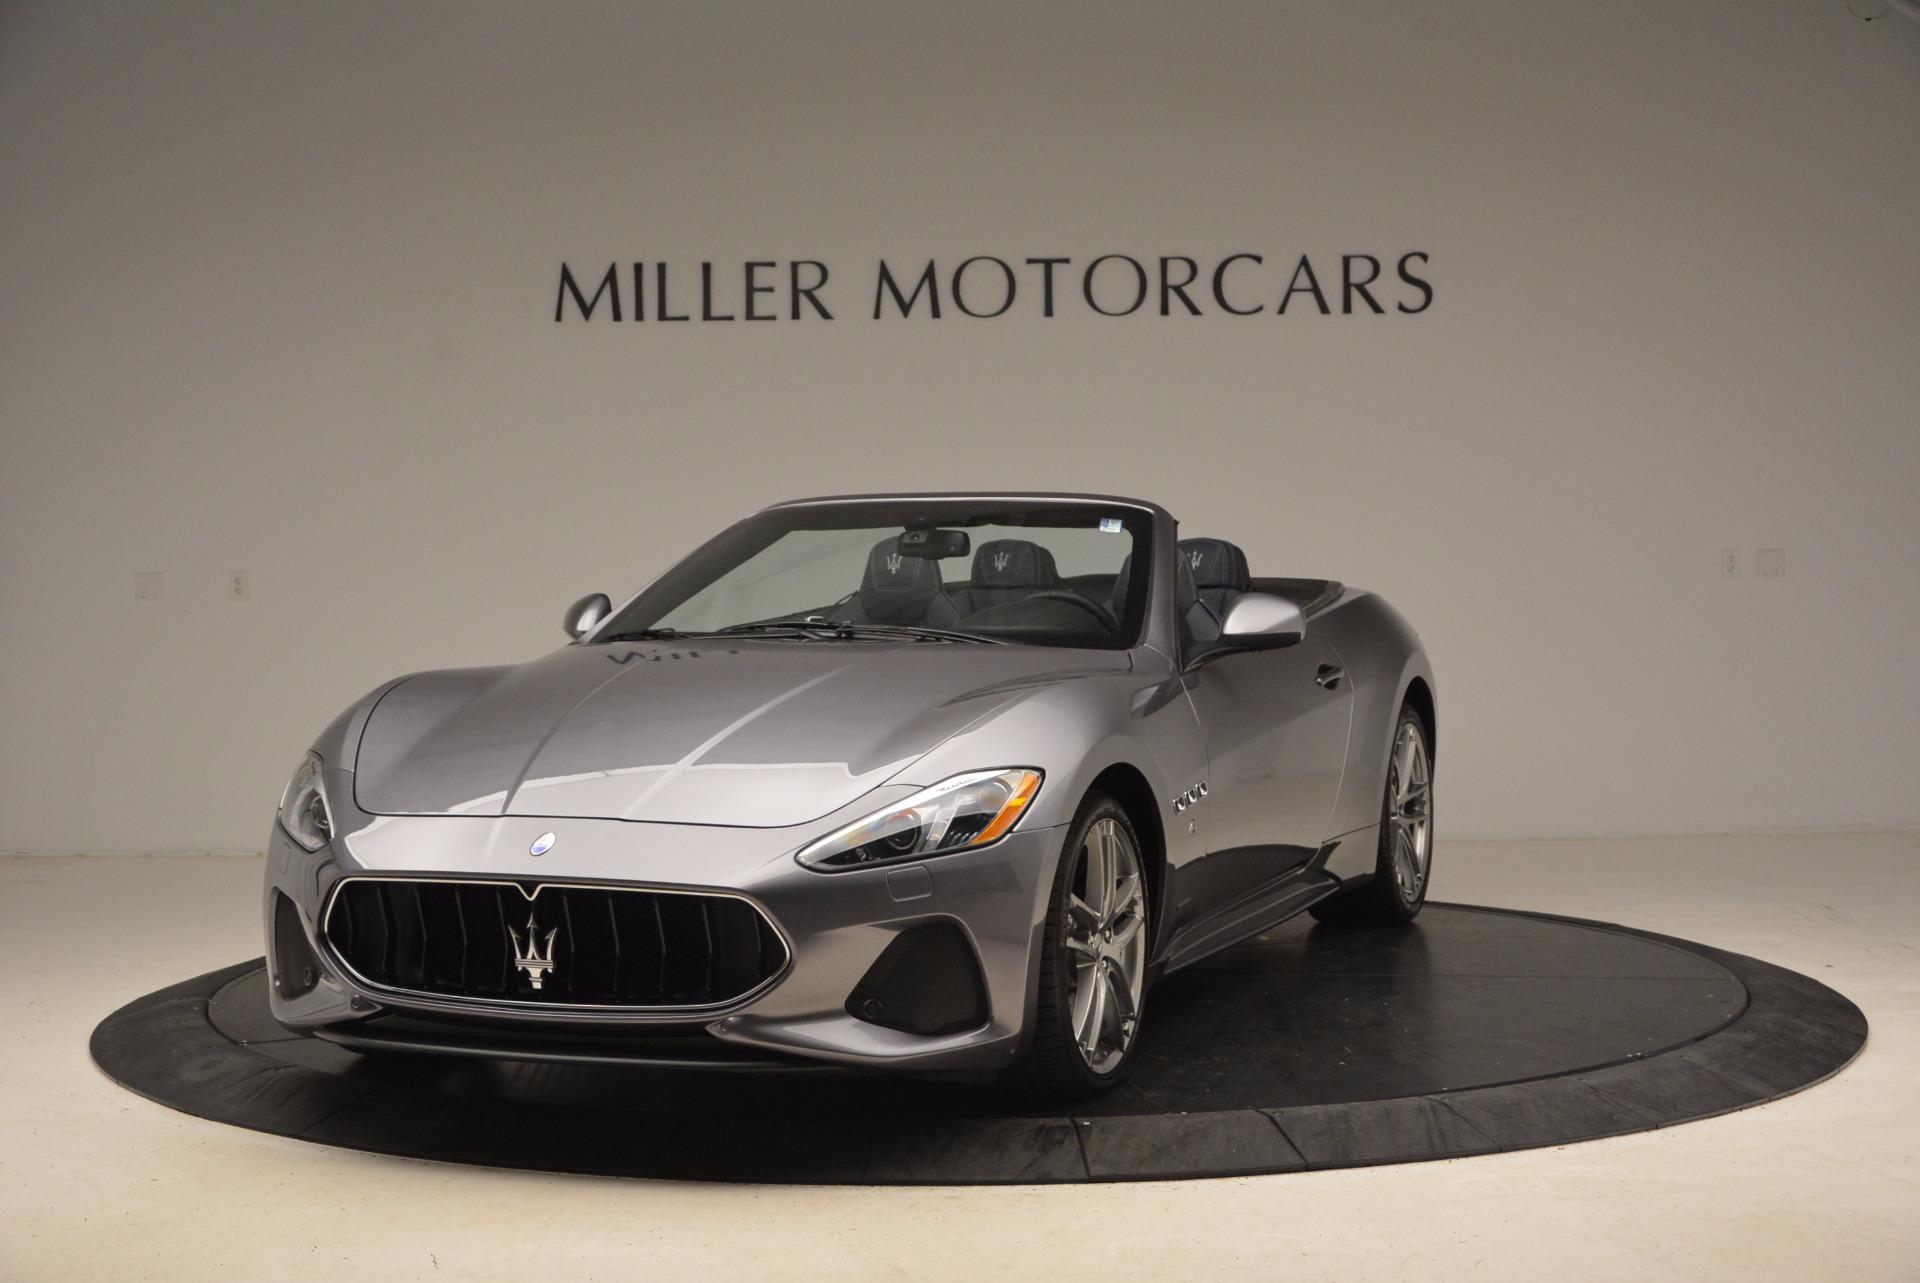 Used 2018 Maserati GranTurismo Sport Convertible for sale Sold at Pagani of Greenwich in Greenwich CT 06830 1